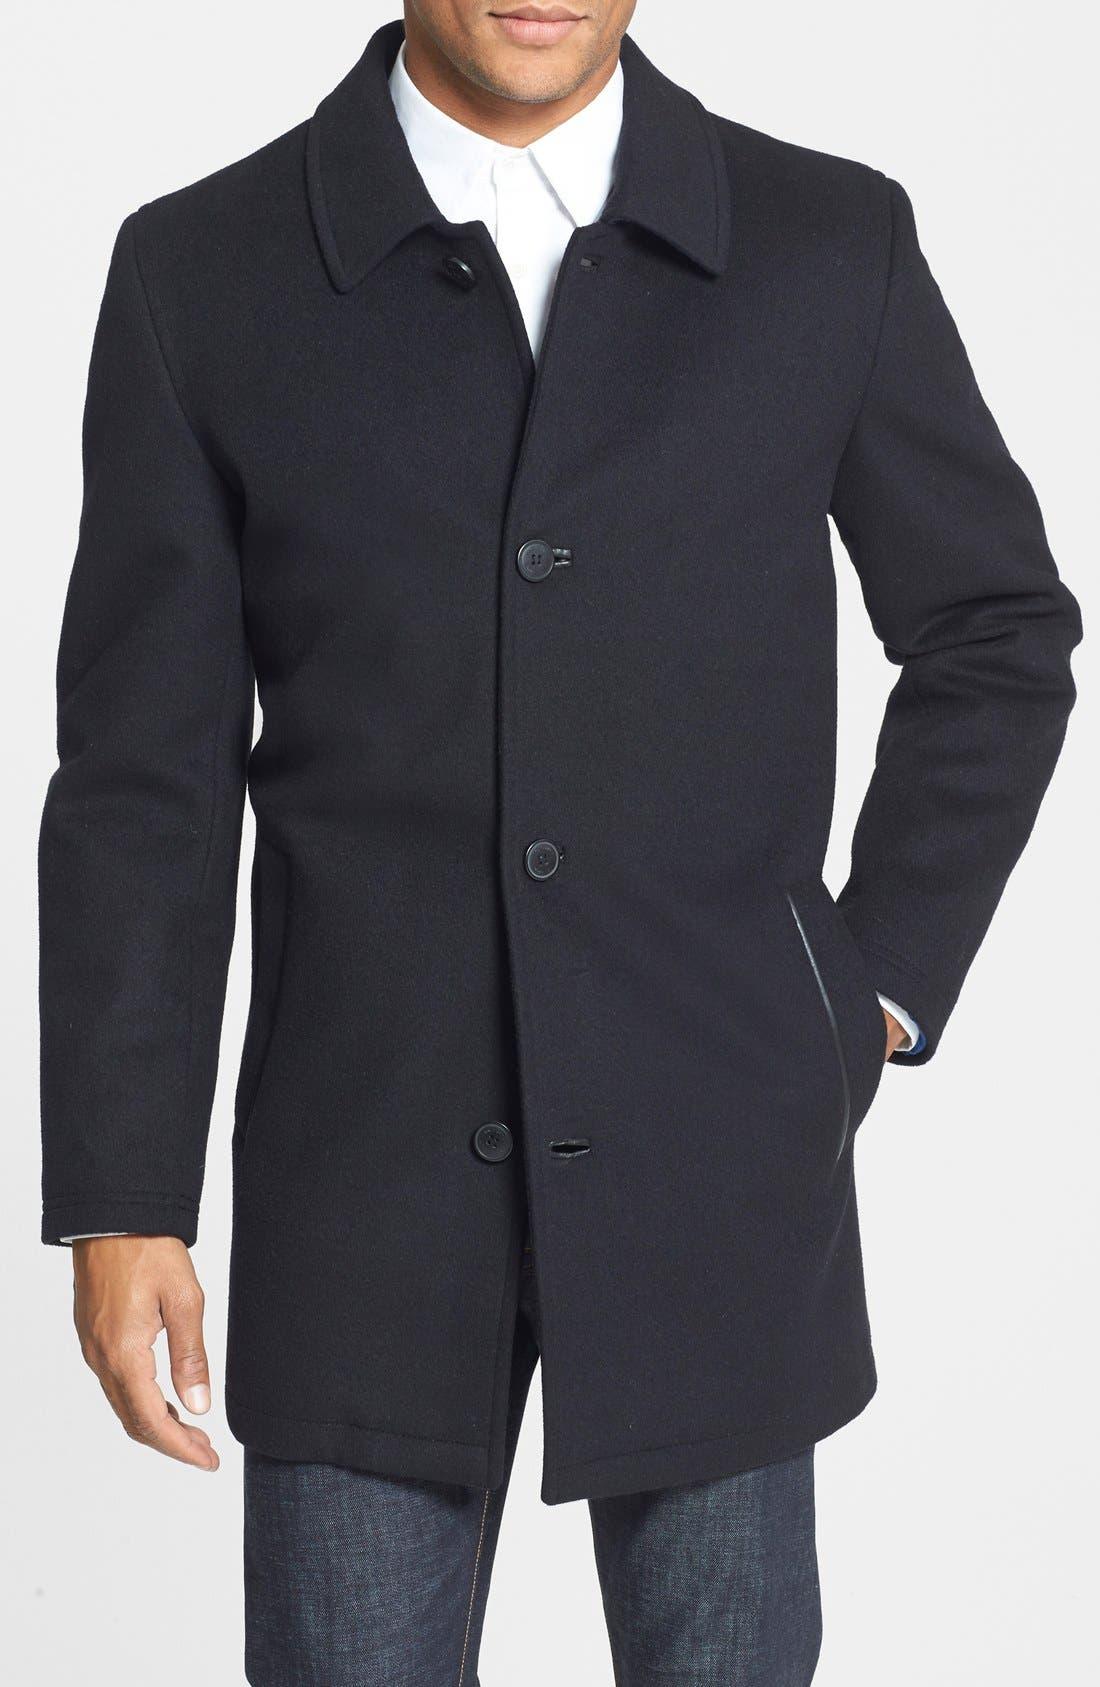 Alternate Image 1 Selected - Vince Camuto Water Repellent Wool Blend Car Coat